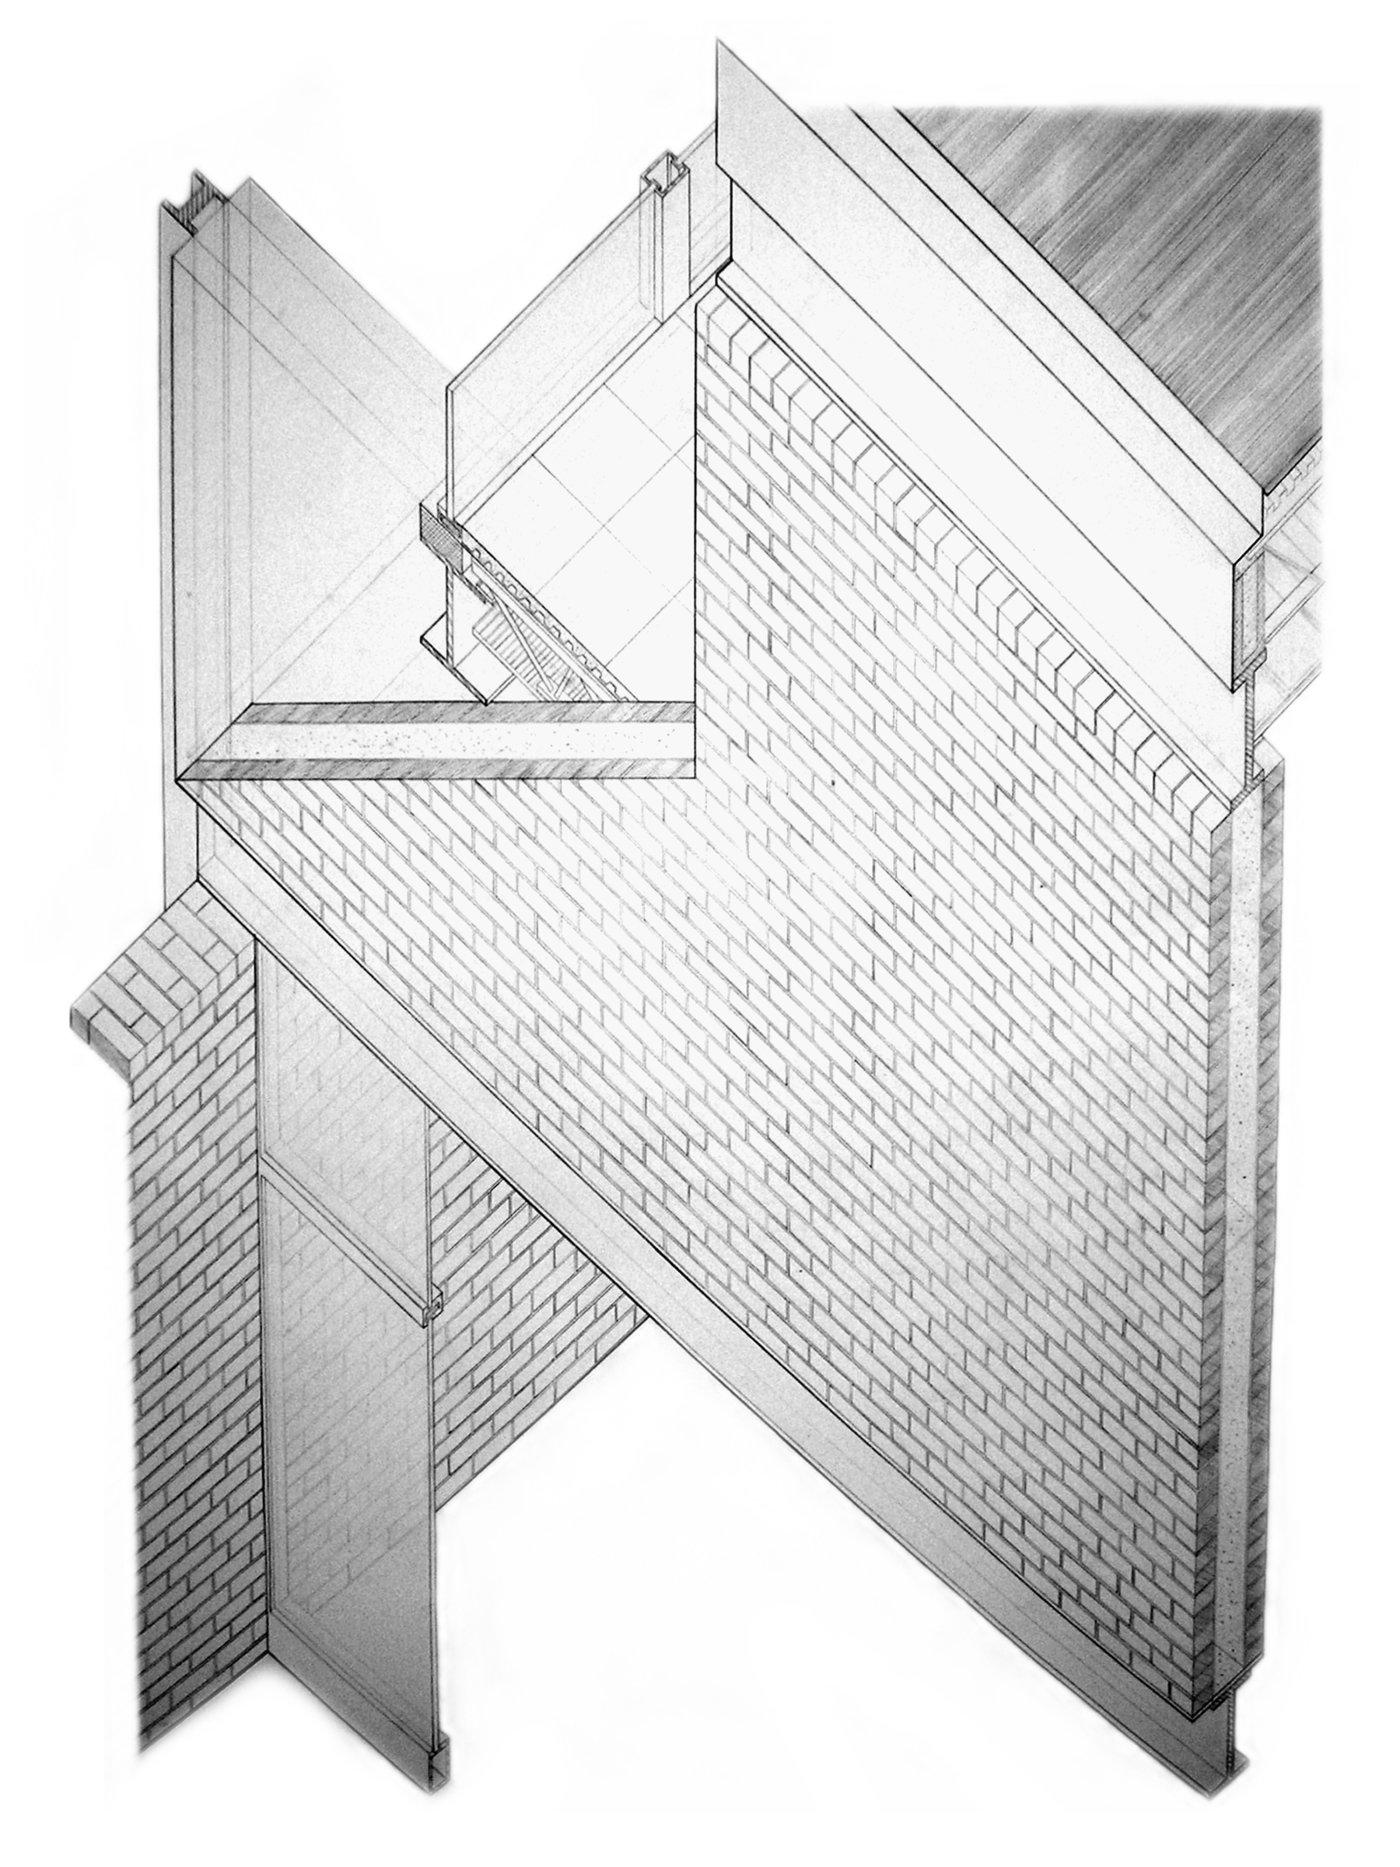 Architecture By Thomas Design At Coroflot Com